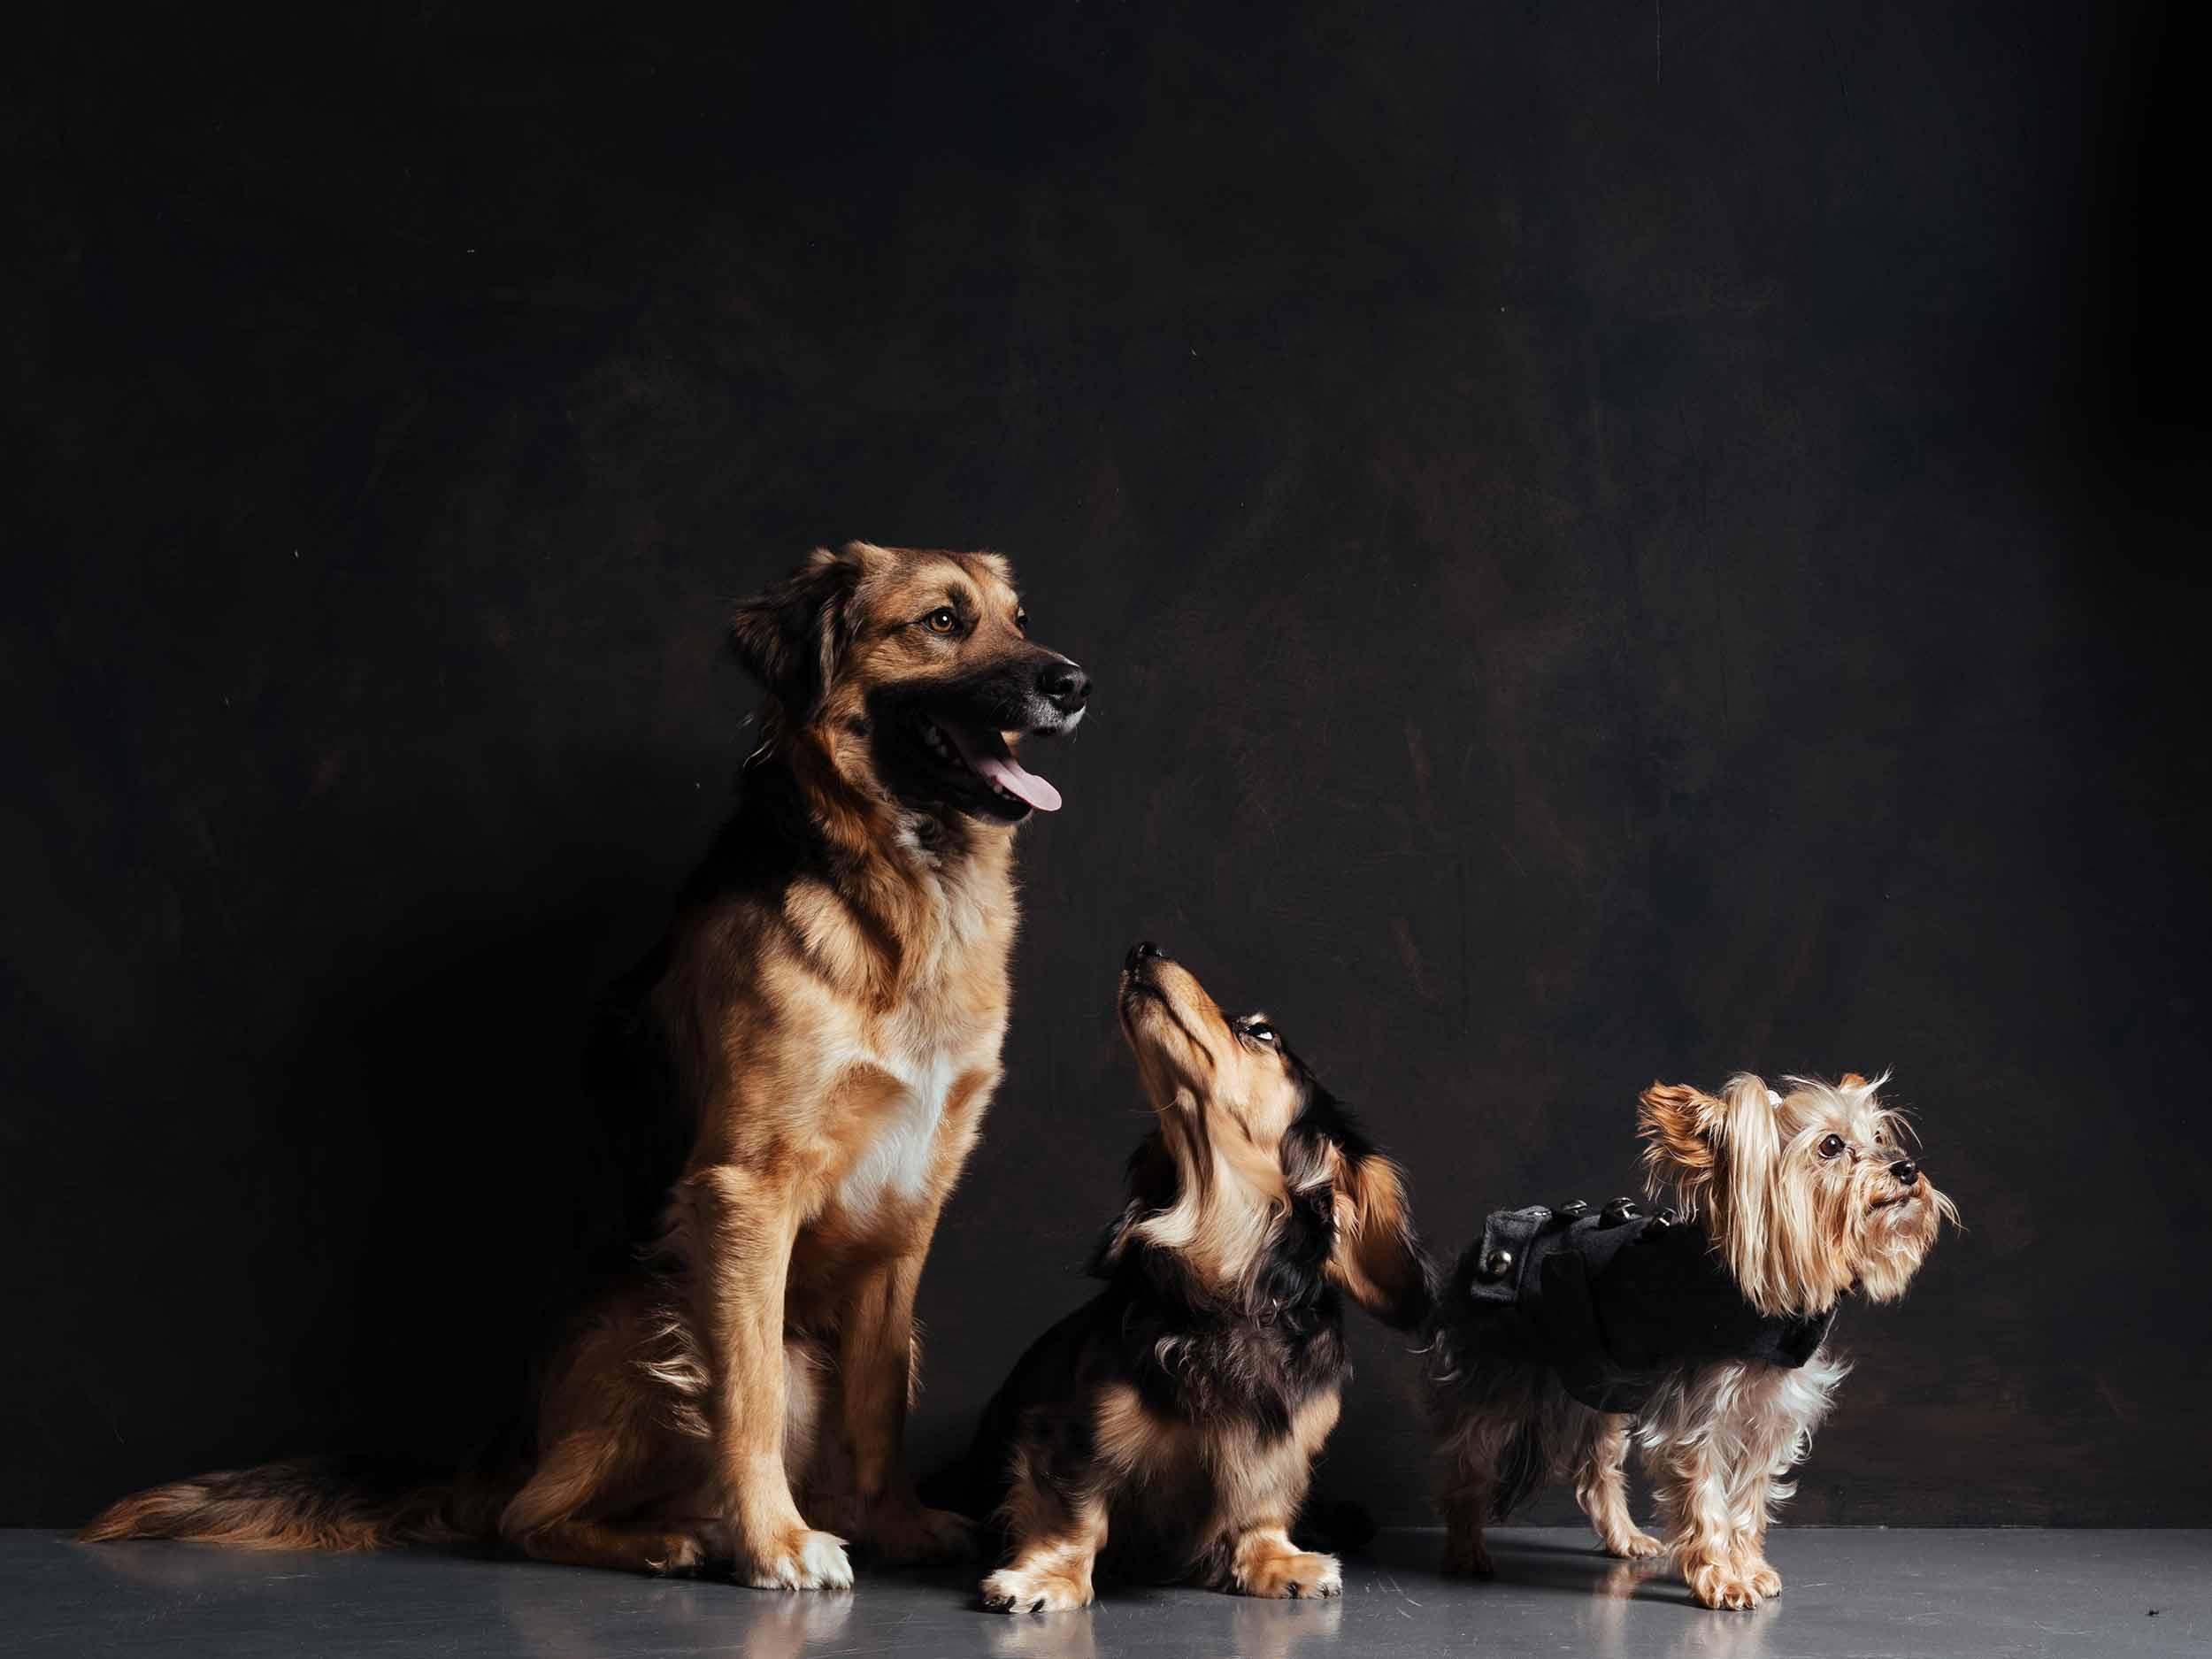 12.01---Dogs-Life_0027_9849.jpg